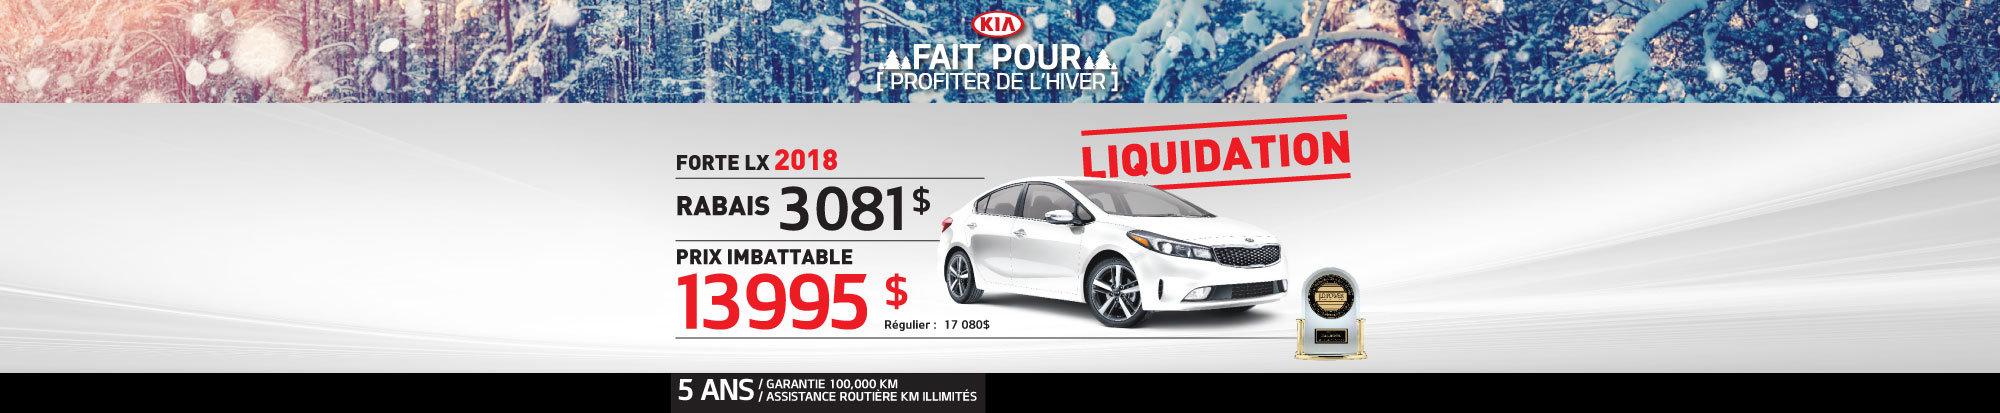 Liquidation Forte 2018 web